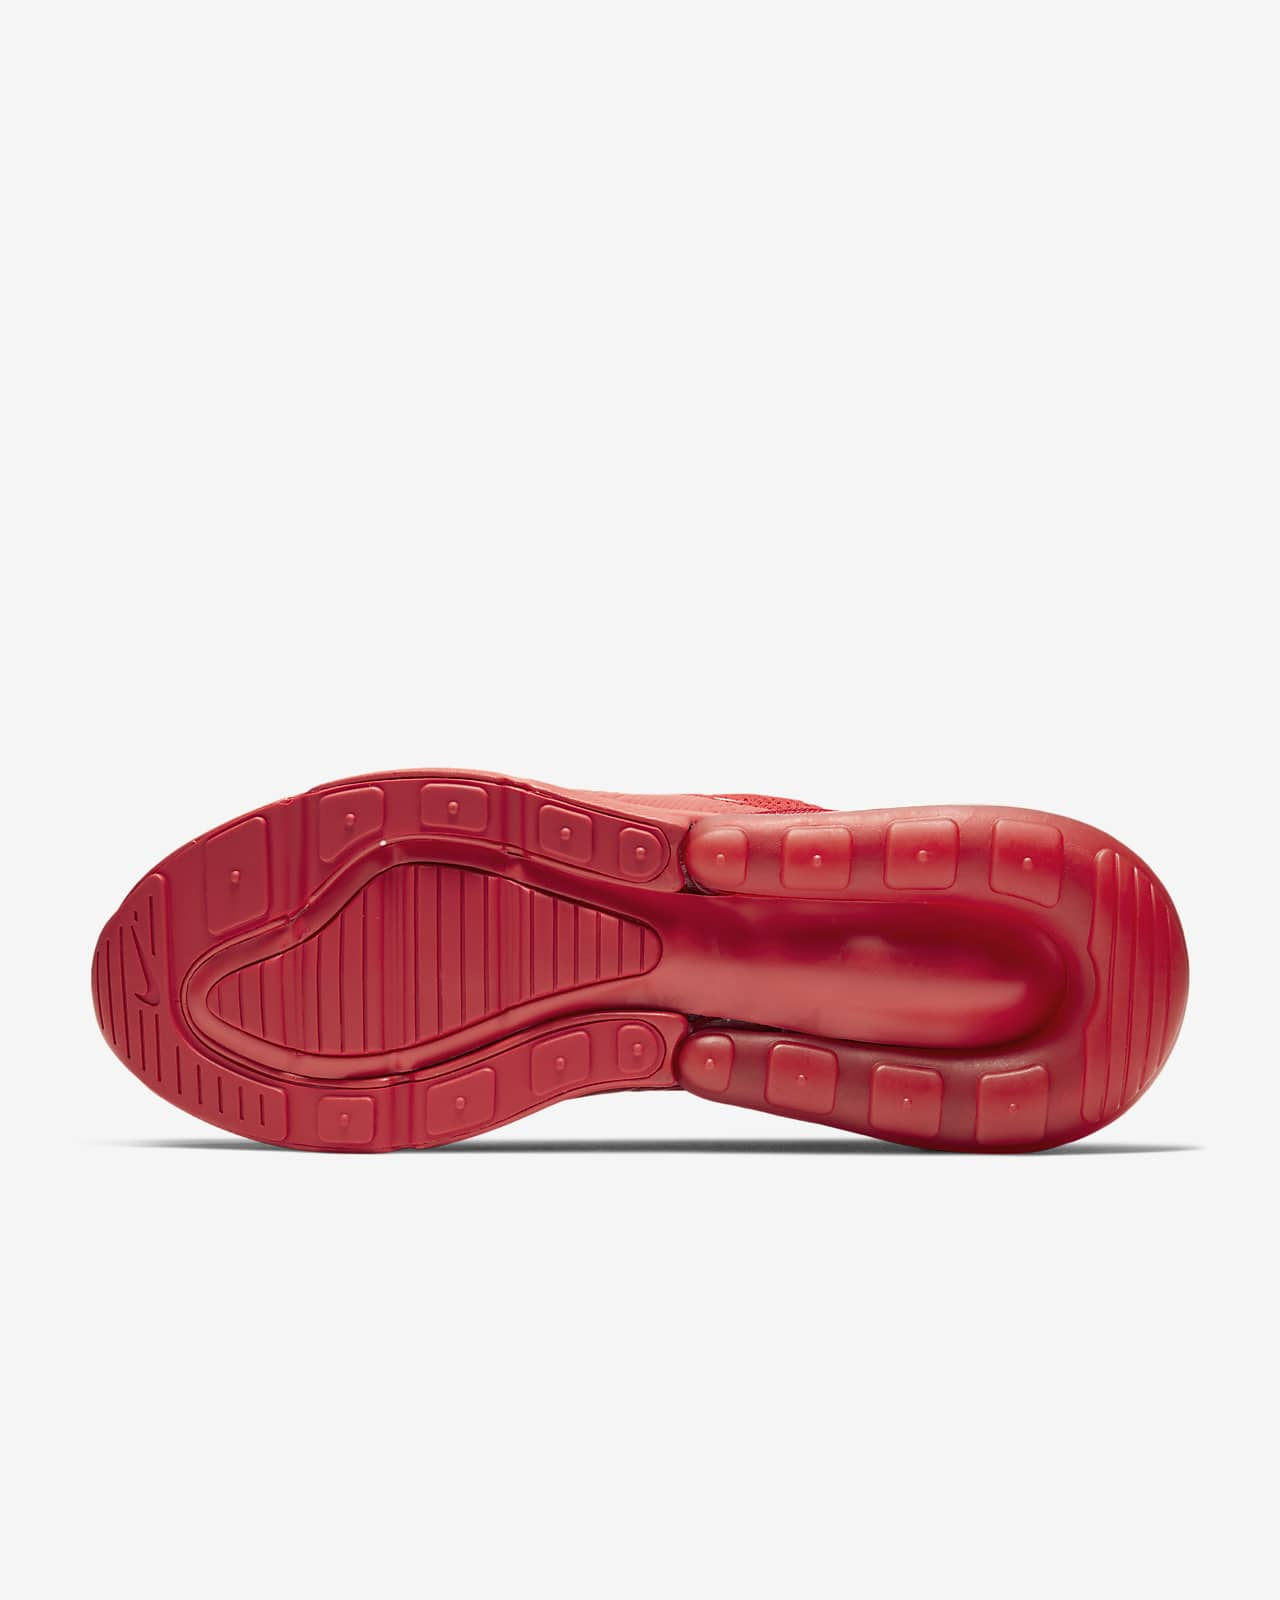 nike air max 270 blancas y rojas